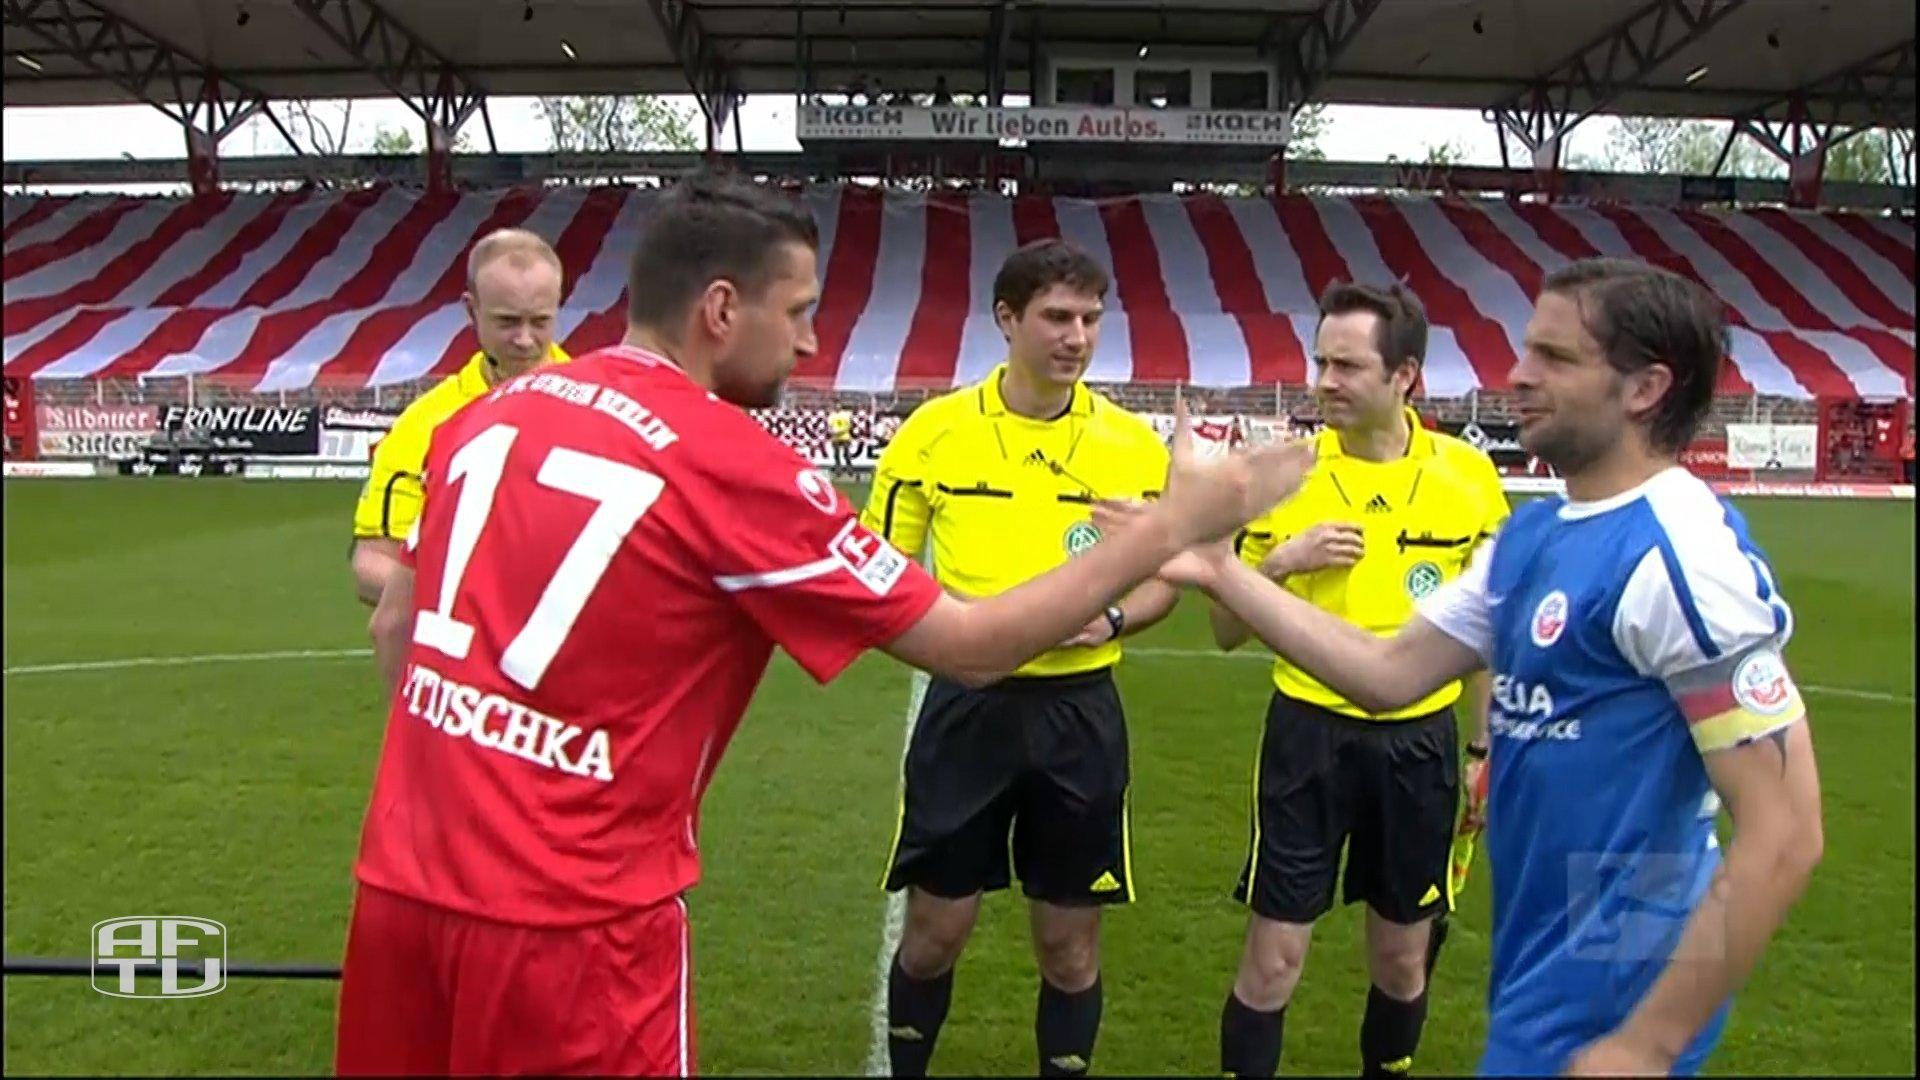 Spielplan Fc Hansa Rostock